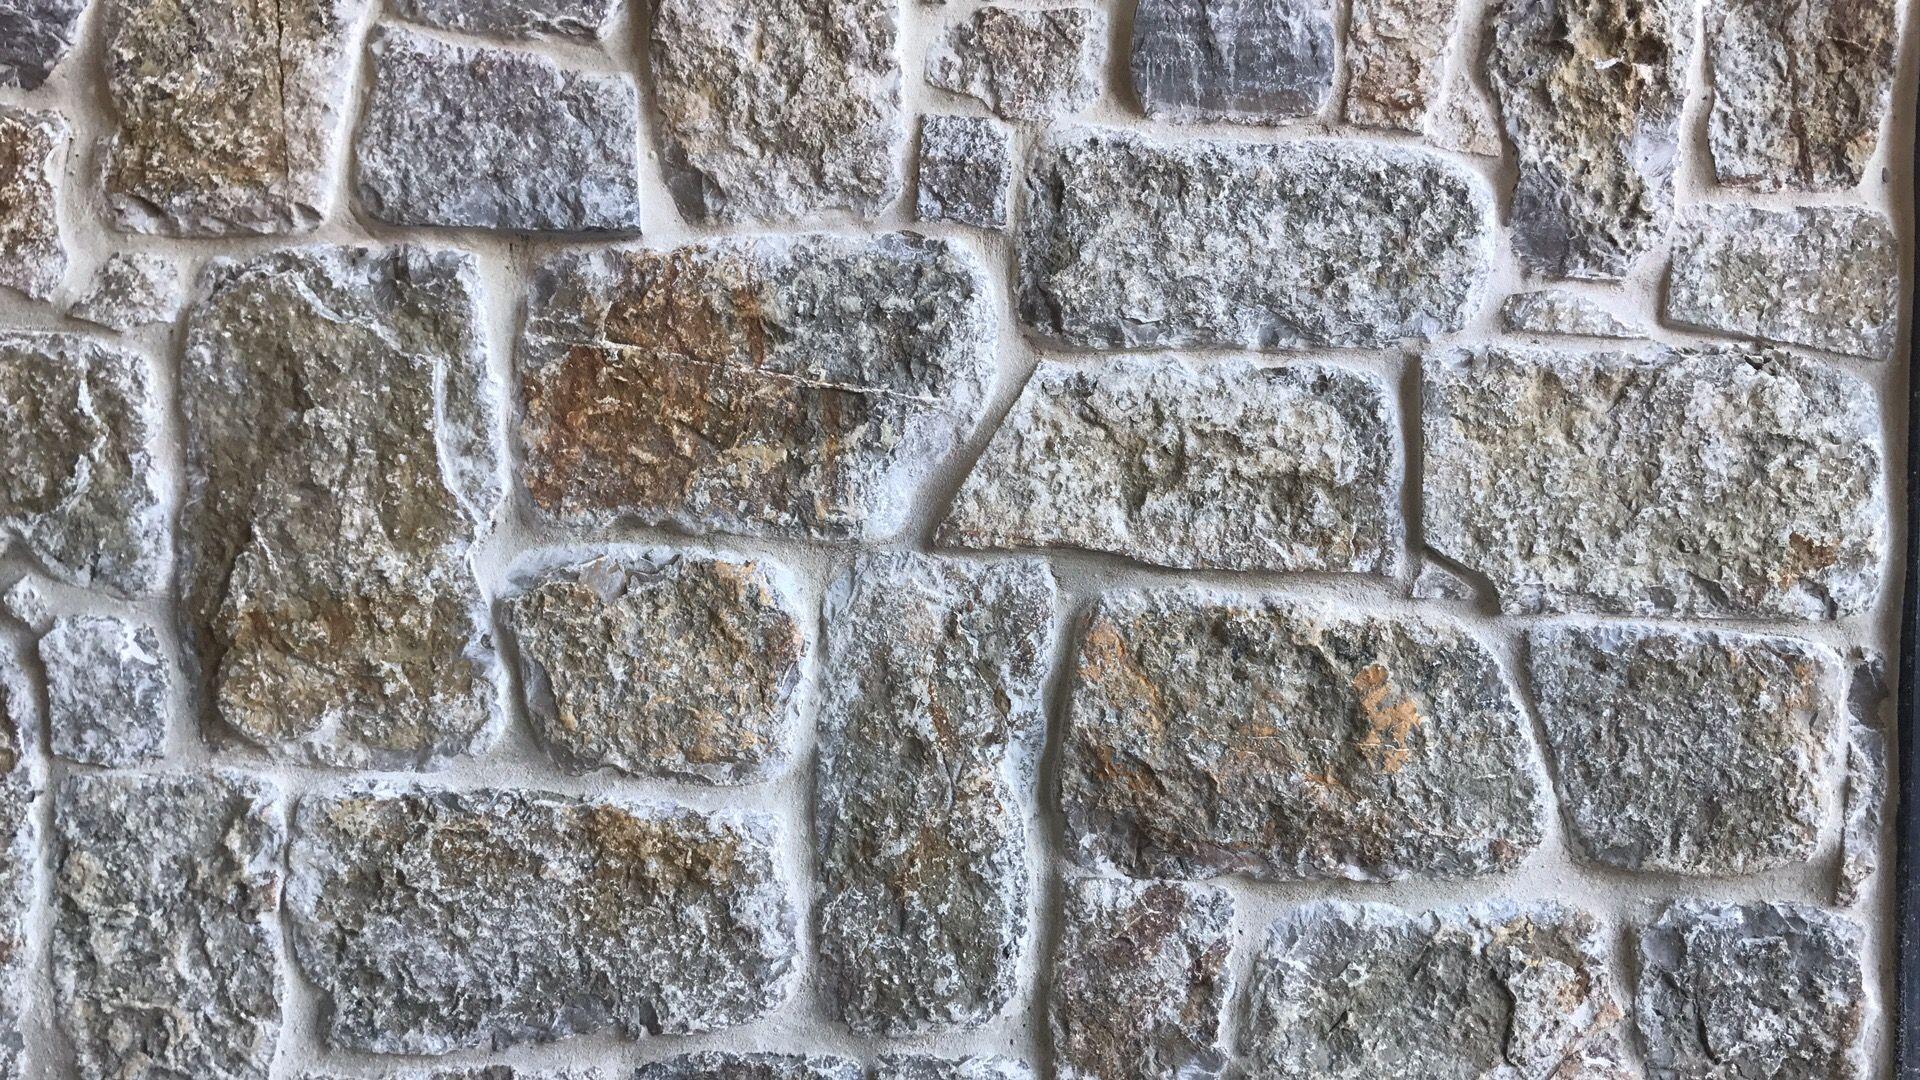 Landscape Design Sandstone Wall Natural Stone Cladding Rockface Sandstone Sandstone Capping Landsca Stone Wall Design Natural Stone Cladding Natural Stone Wall